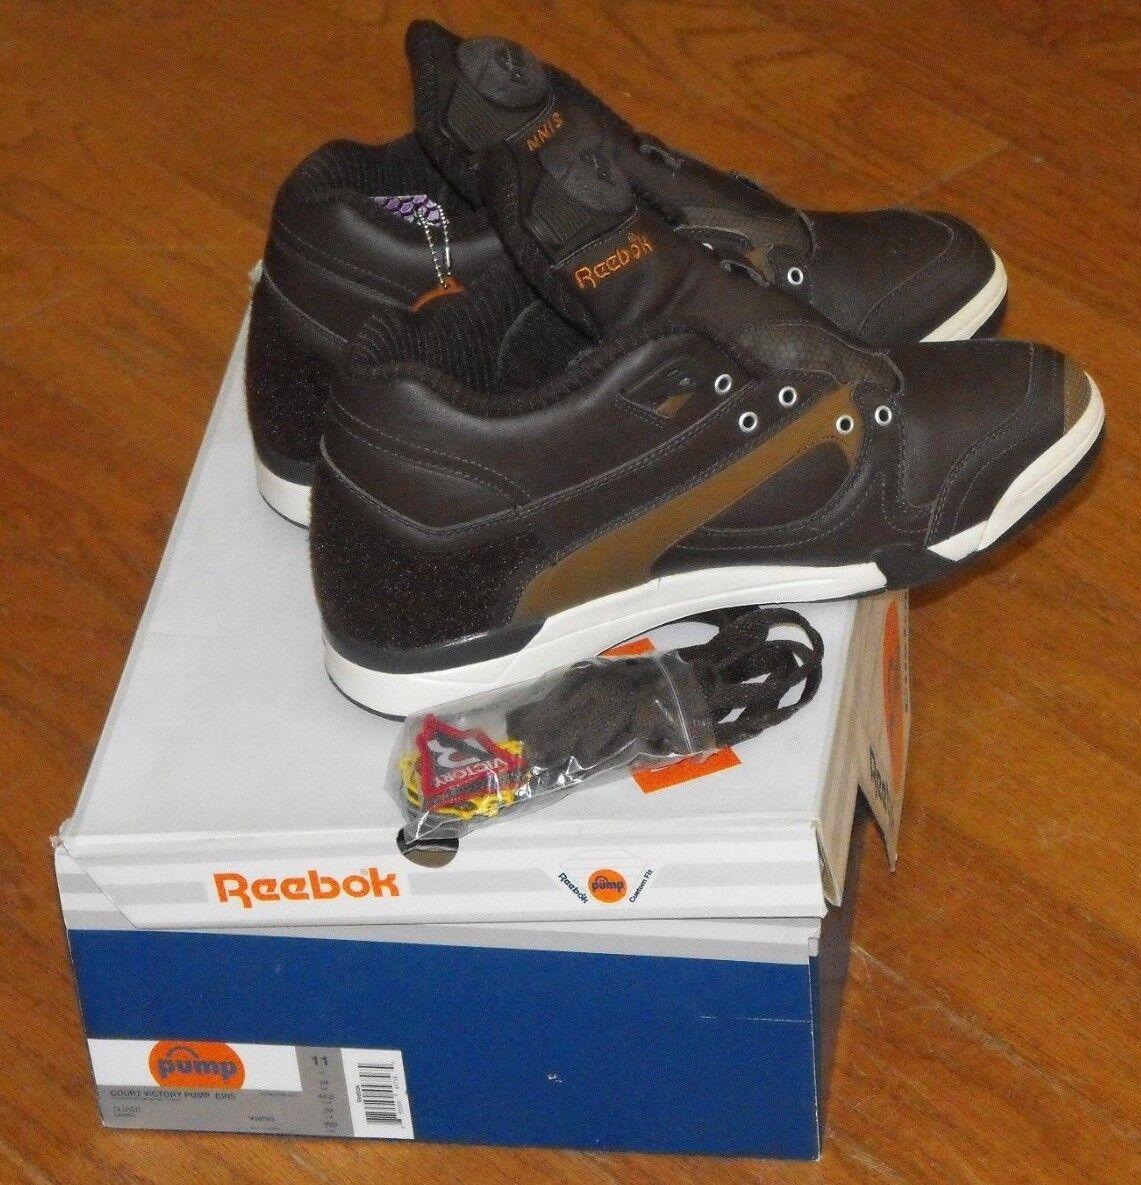 7e917996c3 W/box 2011 Reebok Court Victory Pump Size 11 Bomber Jacket Edition